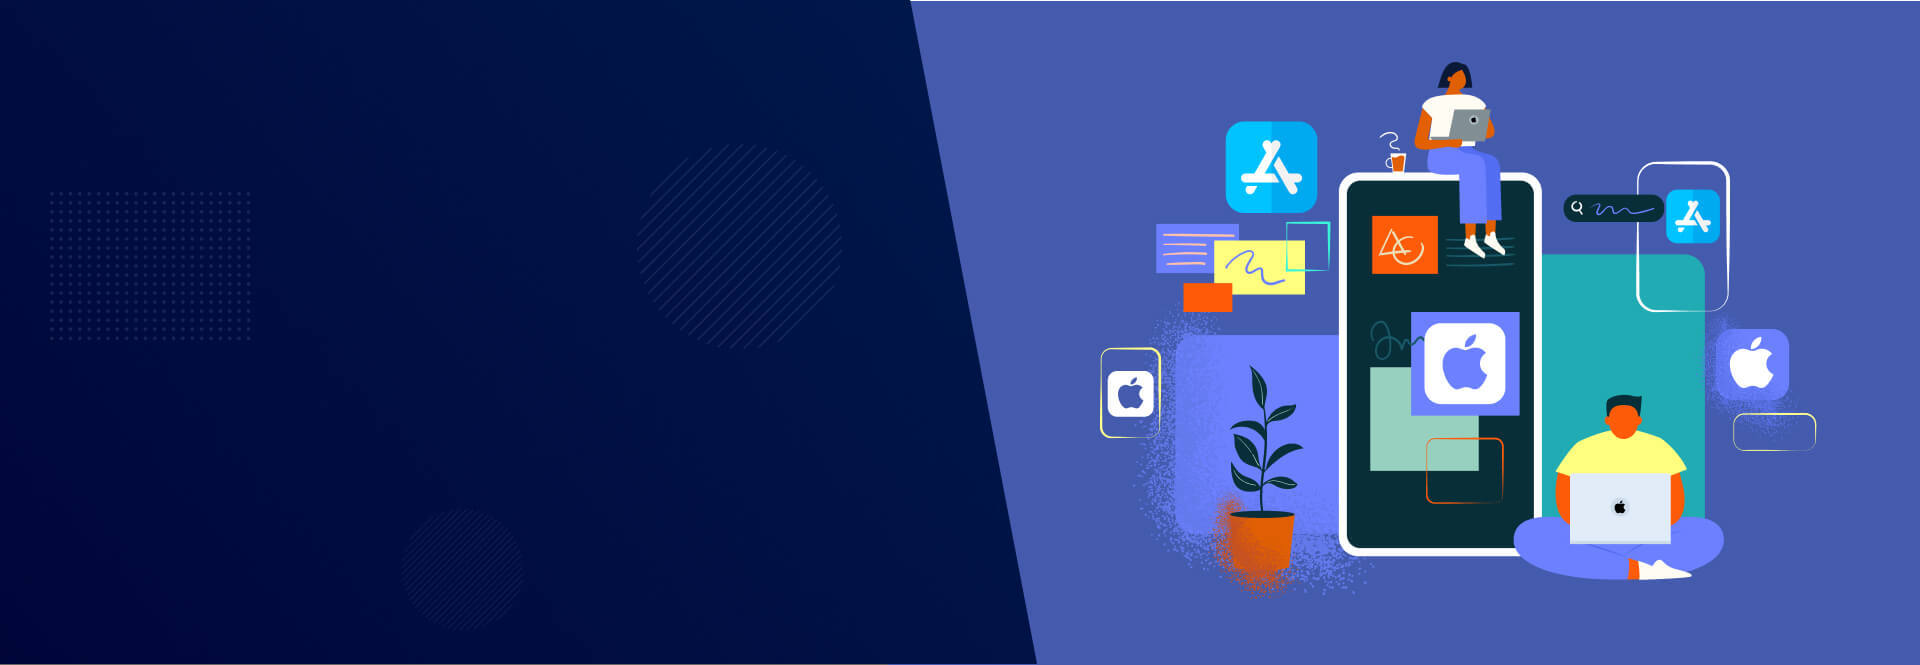 iOSApp-banner